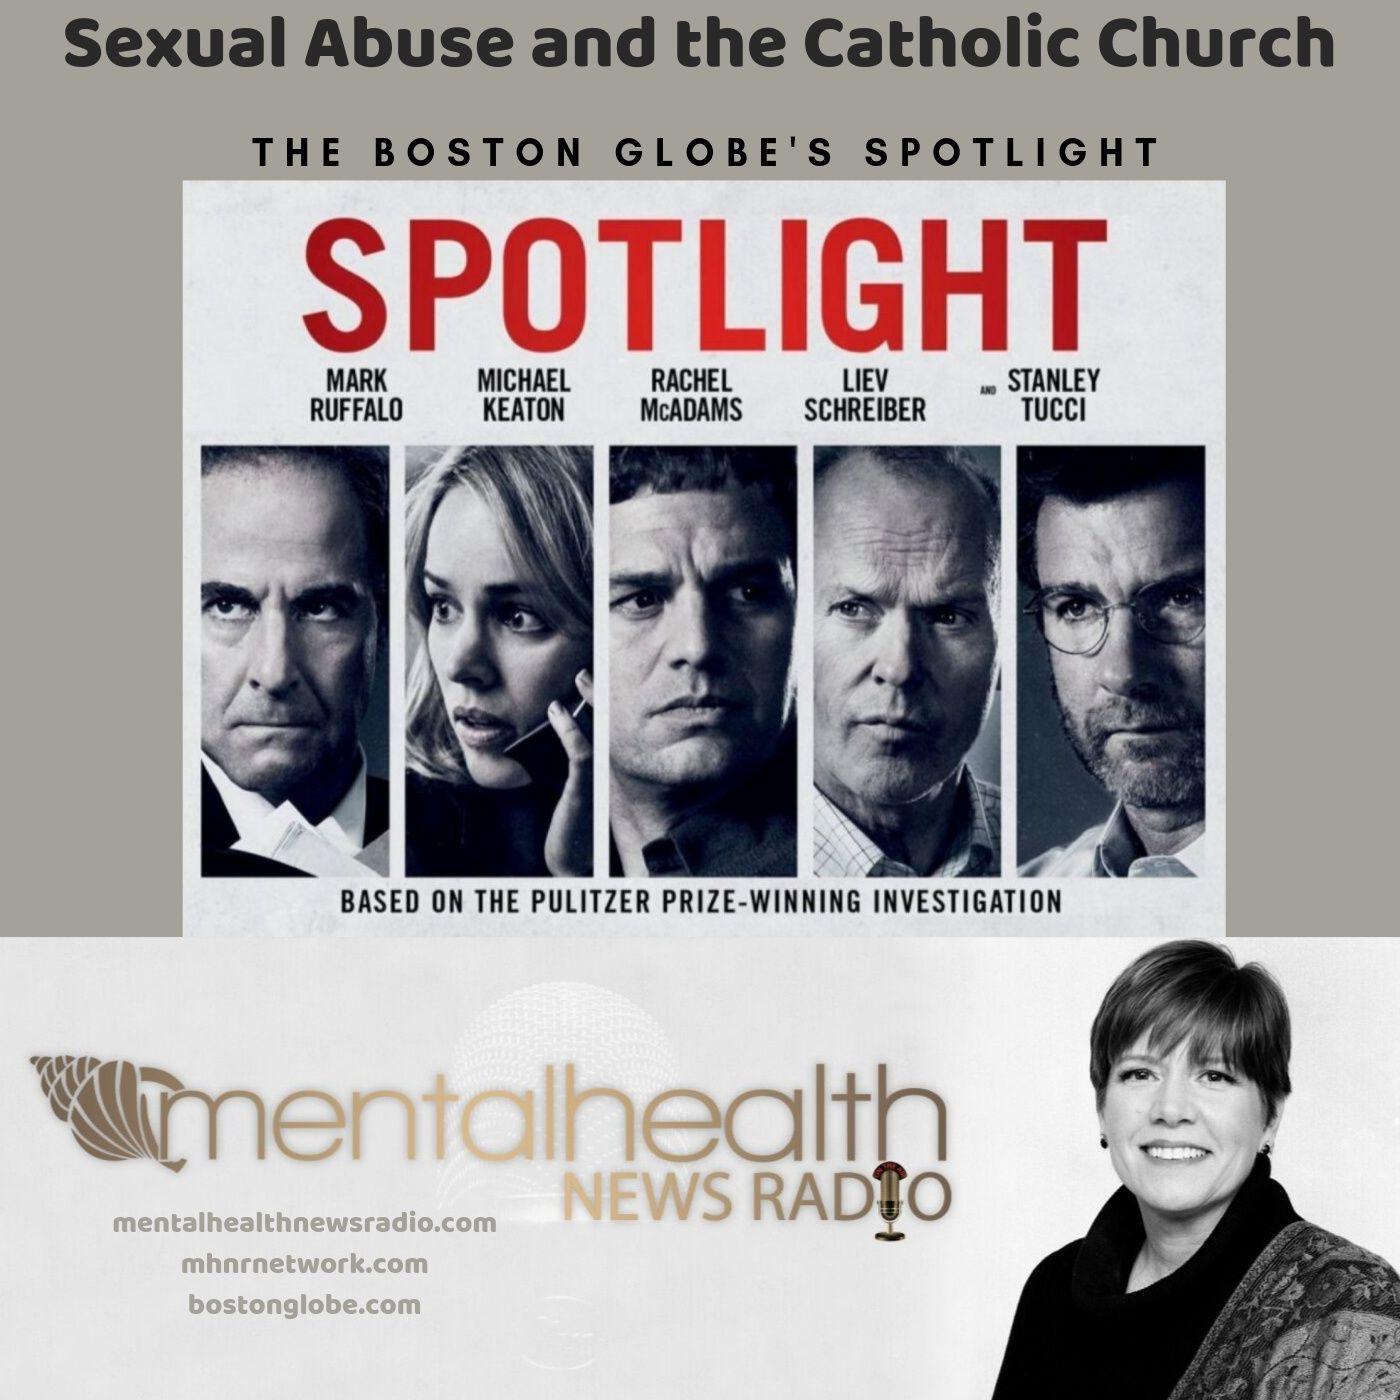 Mental Health News Radio - Sexual Abuse in the Catholic Church: The Boston Globe's Spotlight